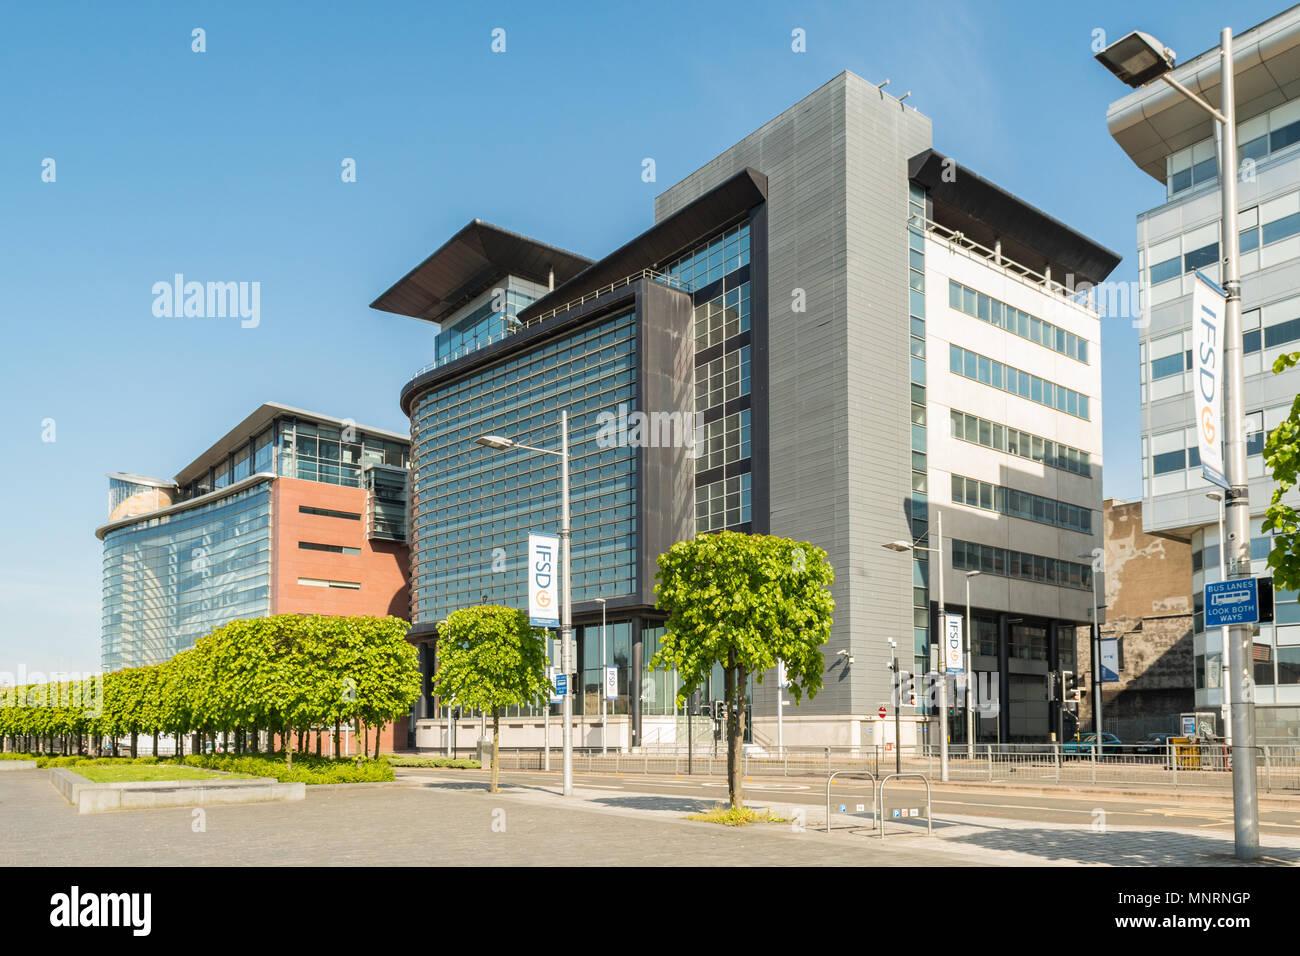 Glasgow International Financial Services District IFSD, 150 and 200 Broomielaw, Glasgow, Scotland, UK - Stock Image